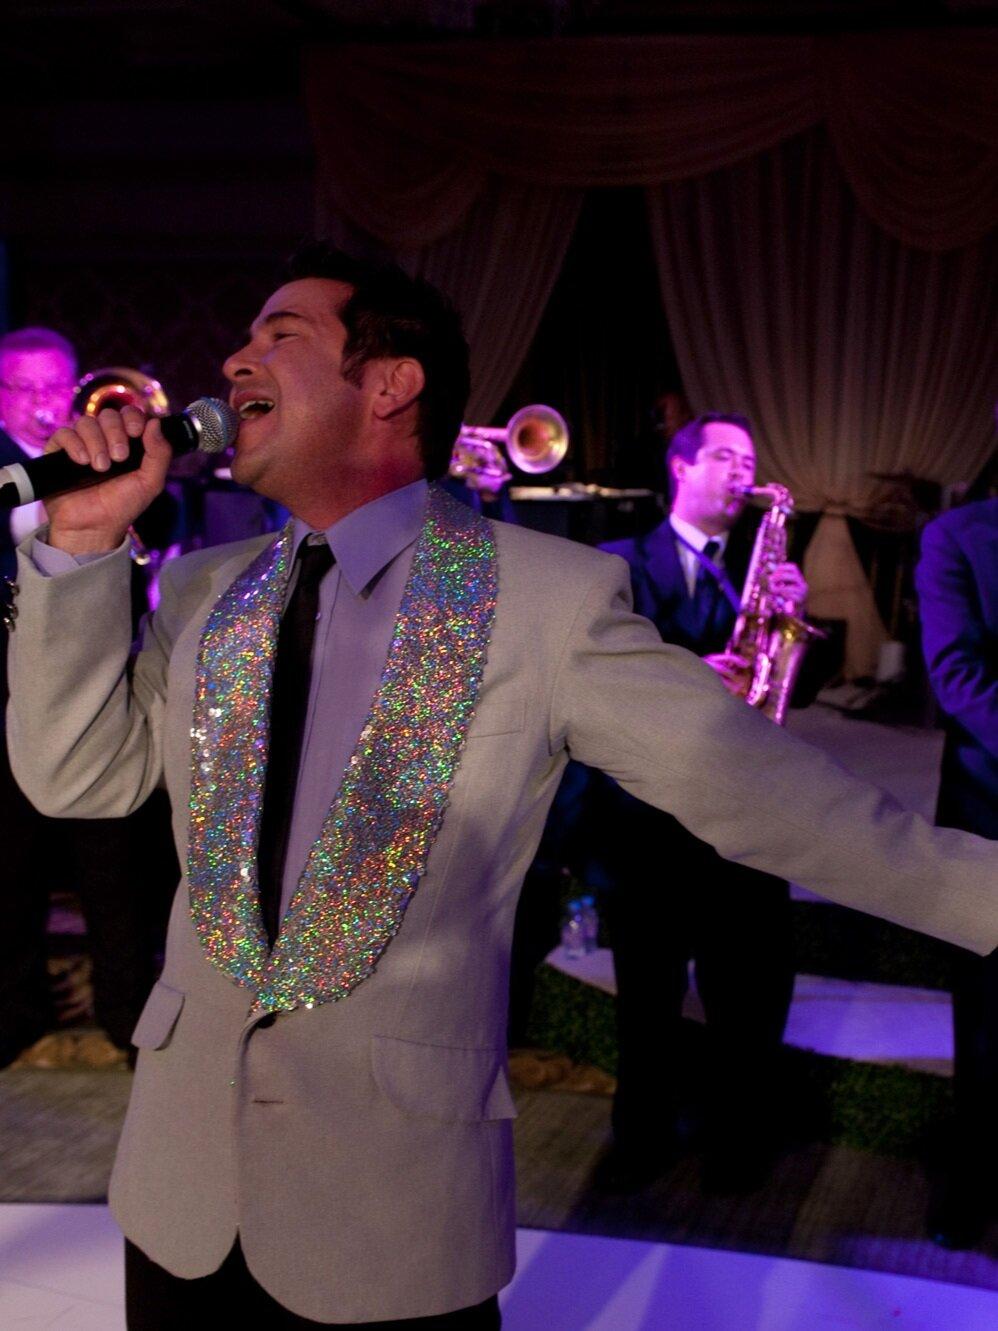 birch-bespoke-events-and-weddings-27.jpg